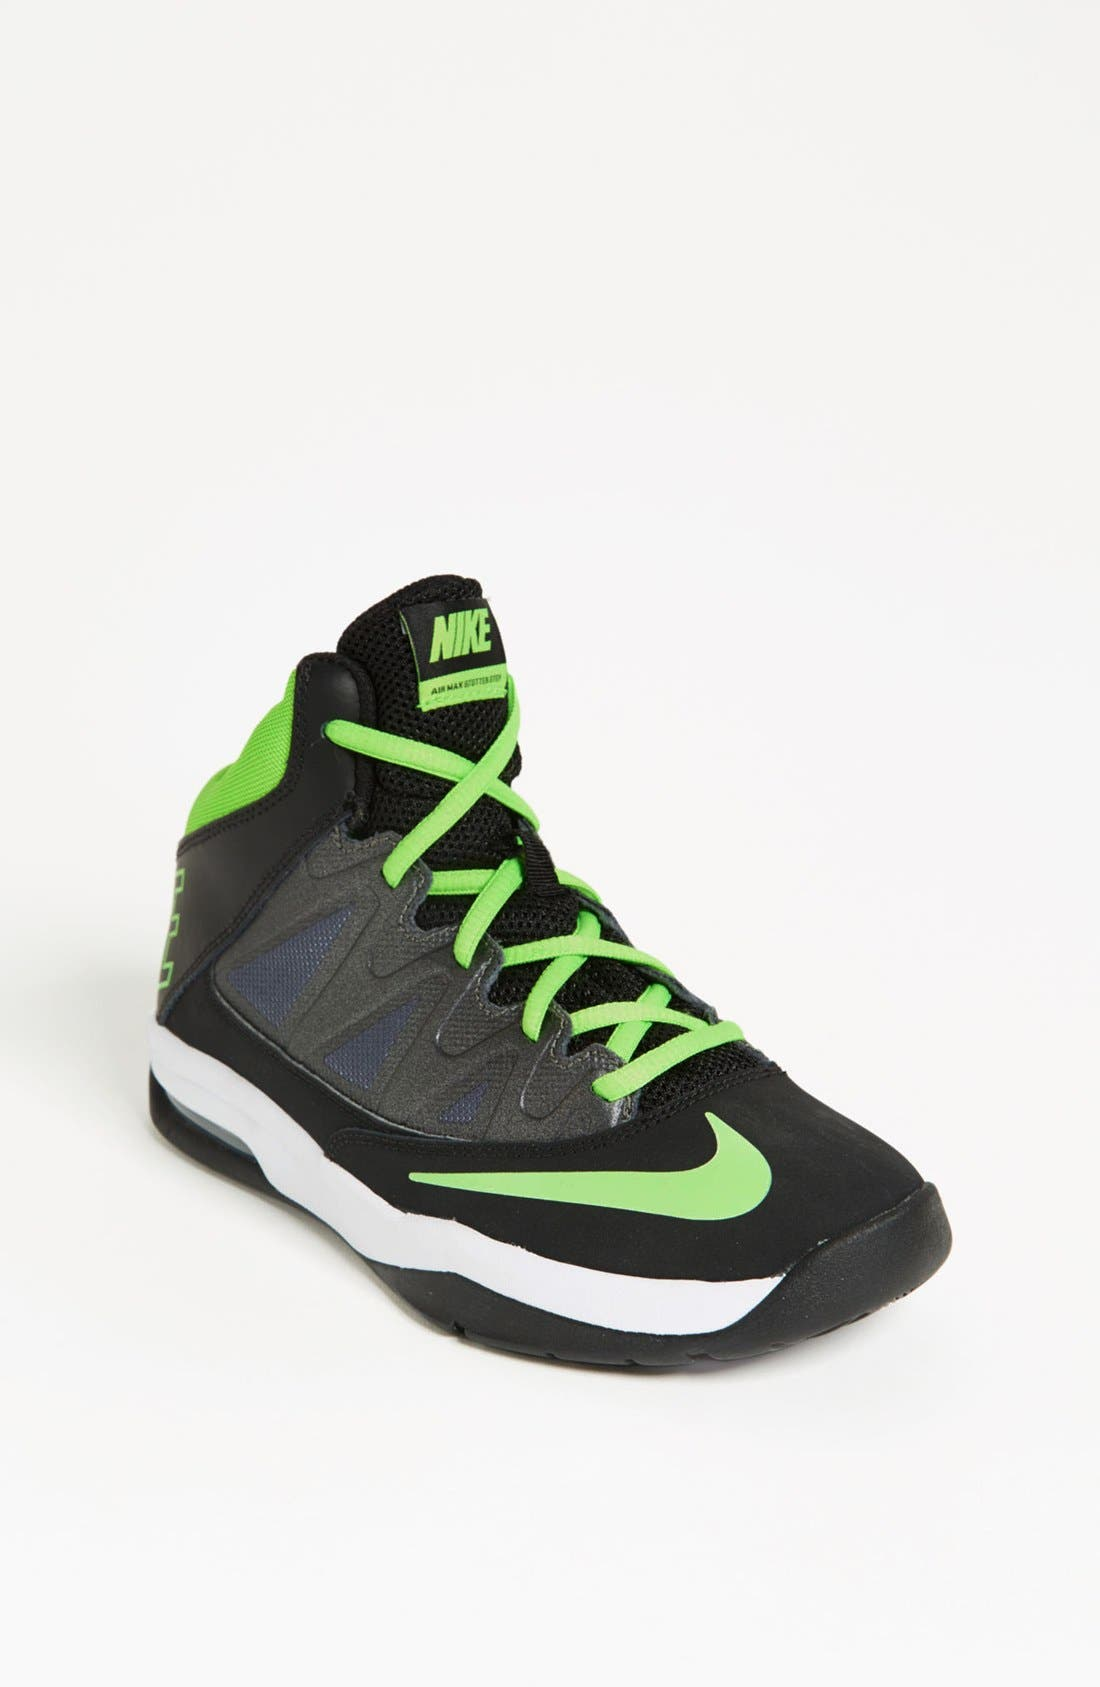 Alternate Image 1 Selected - Nike 'Air Max Stutter Step' Basketball Shoe (Big Kid)